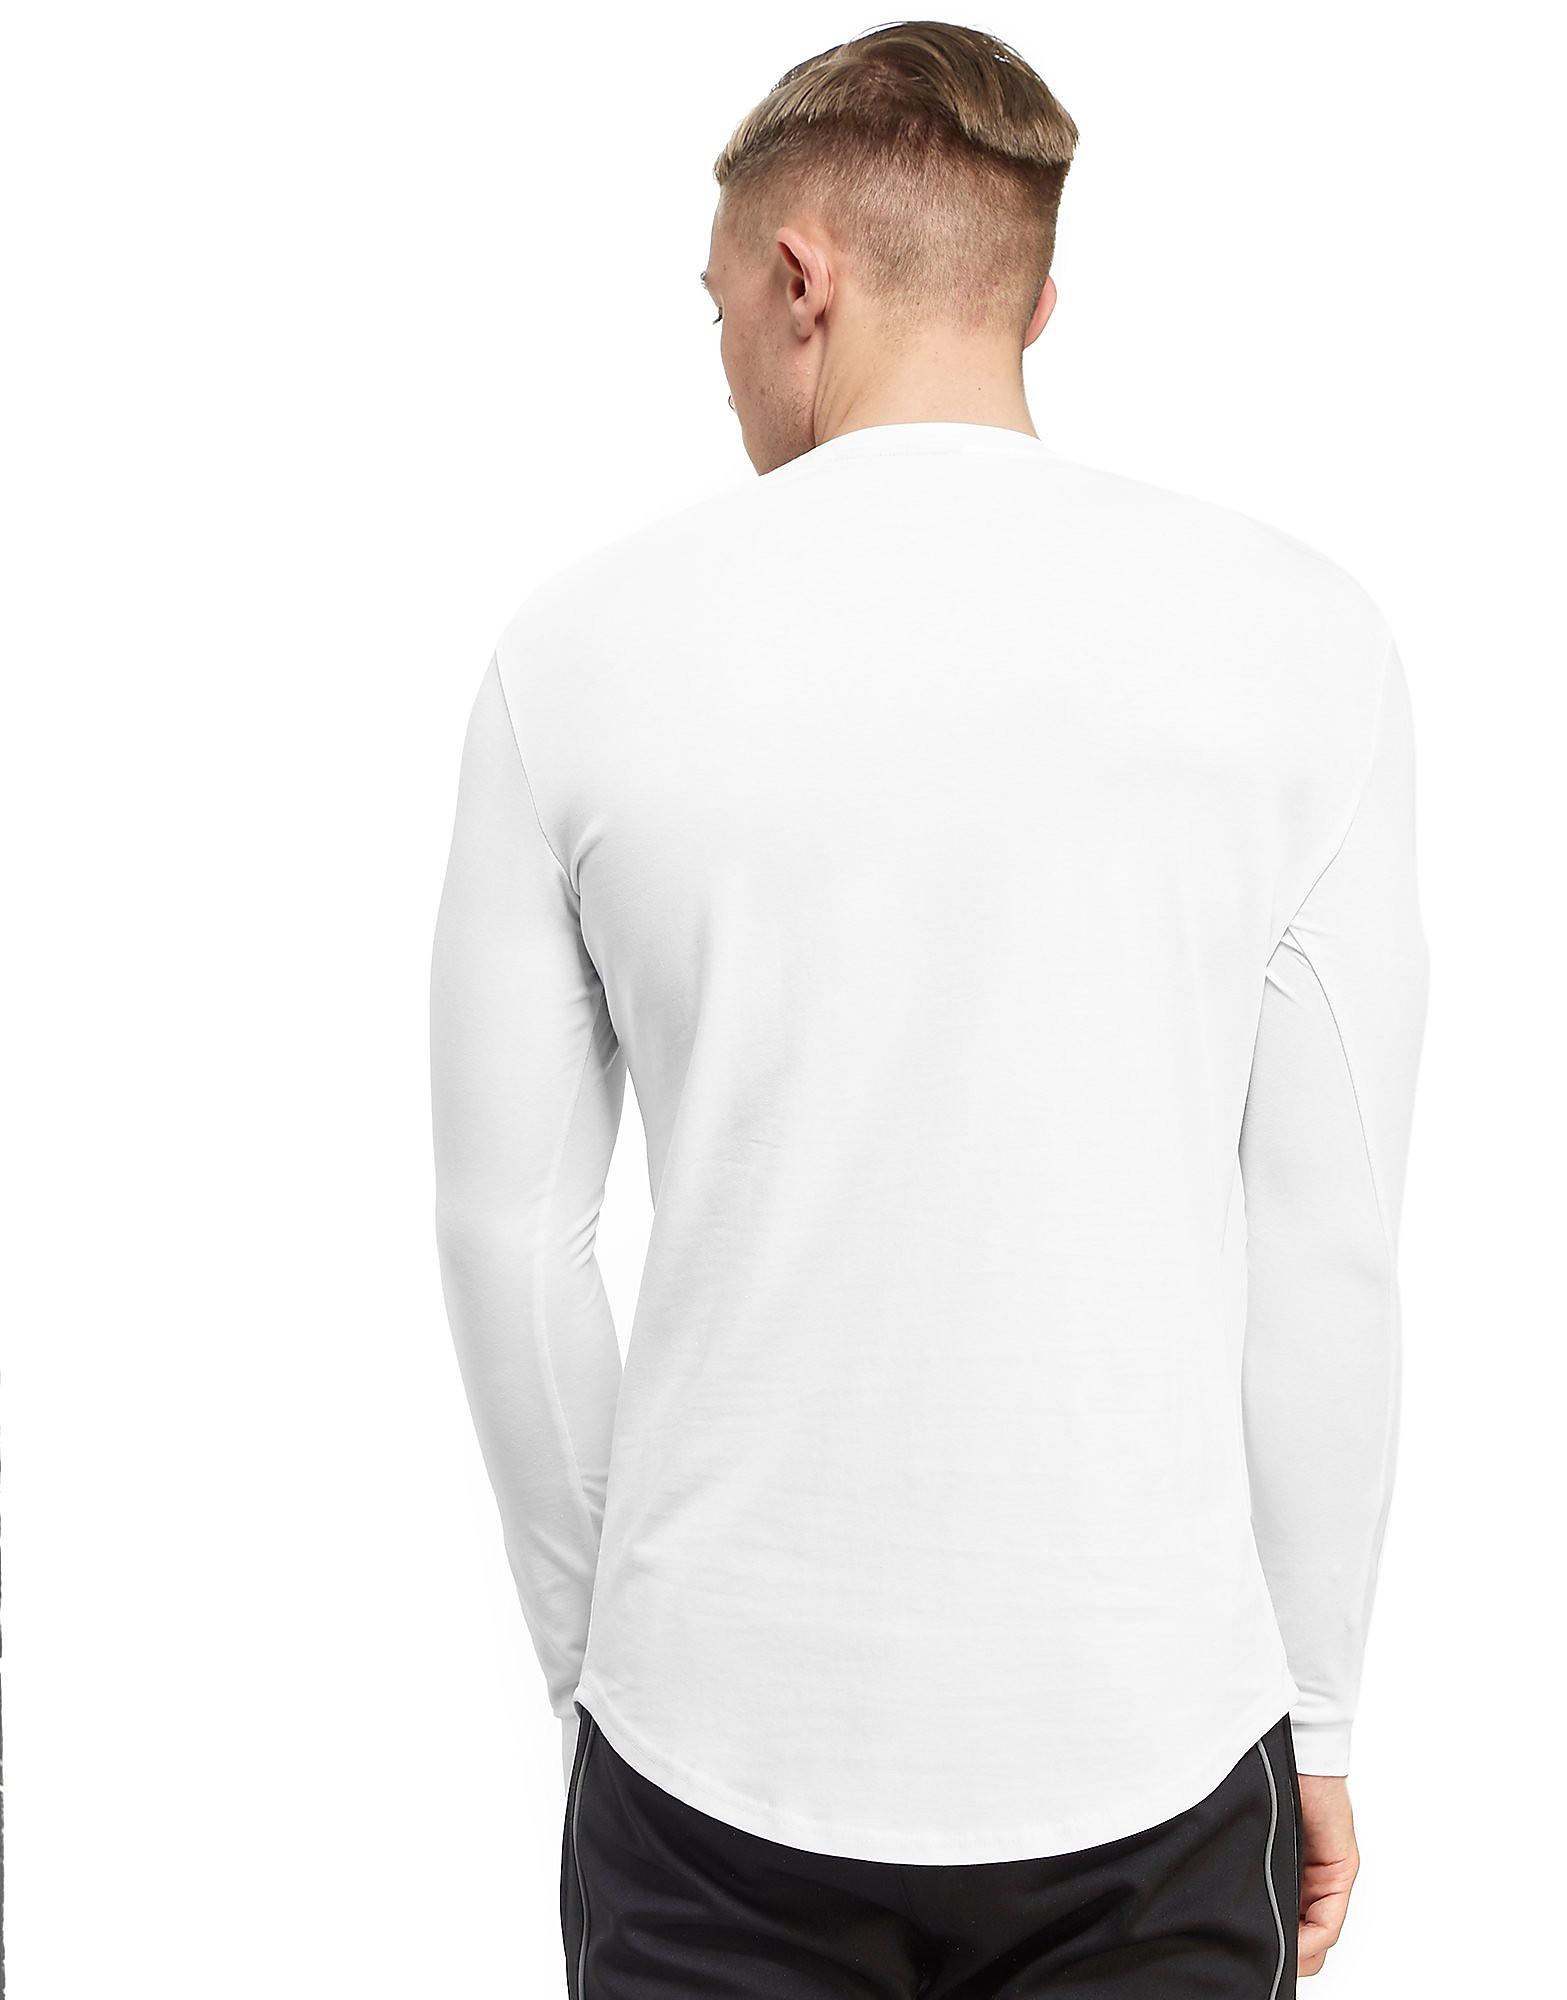 Gym King Core Long Sleeve T-Shirt